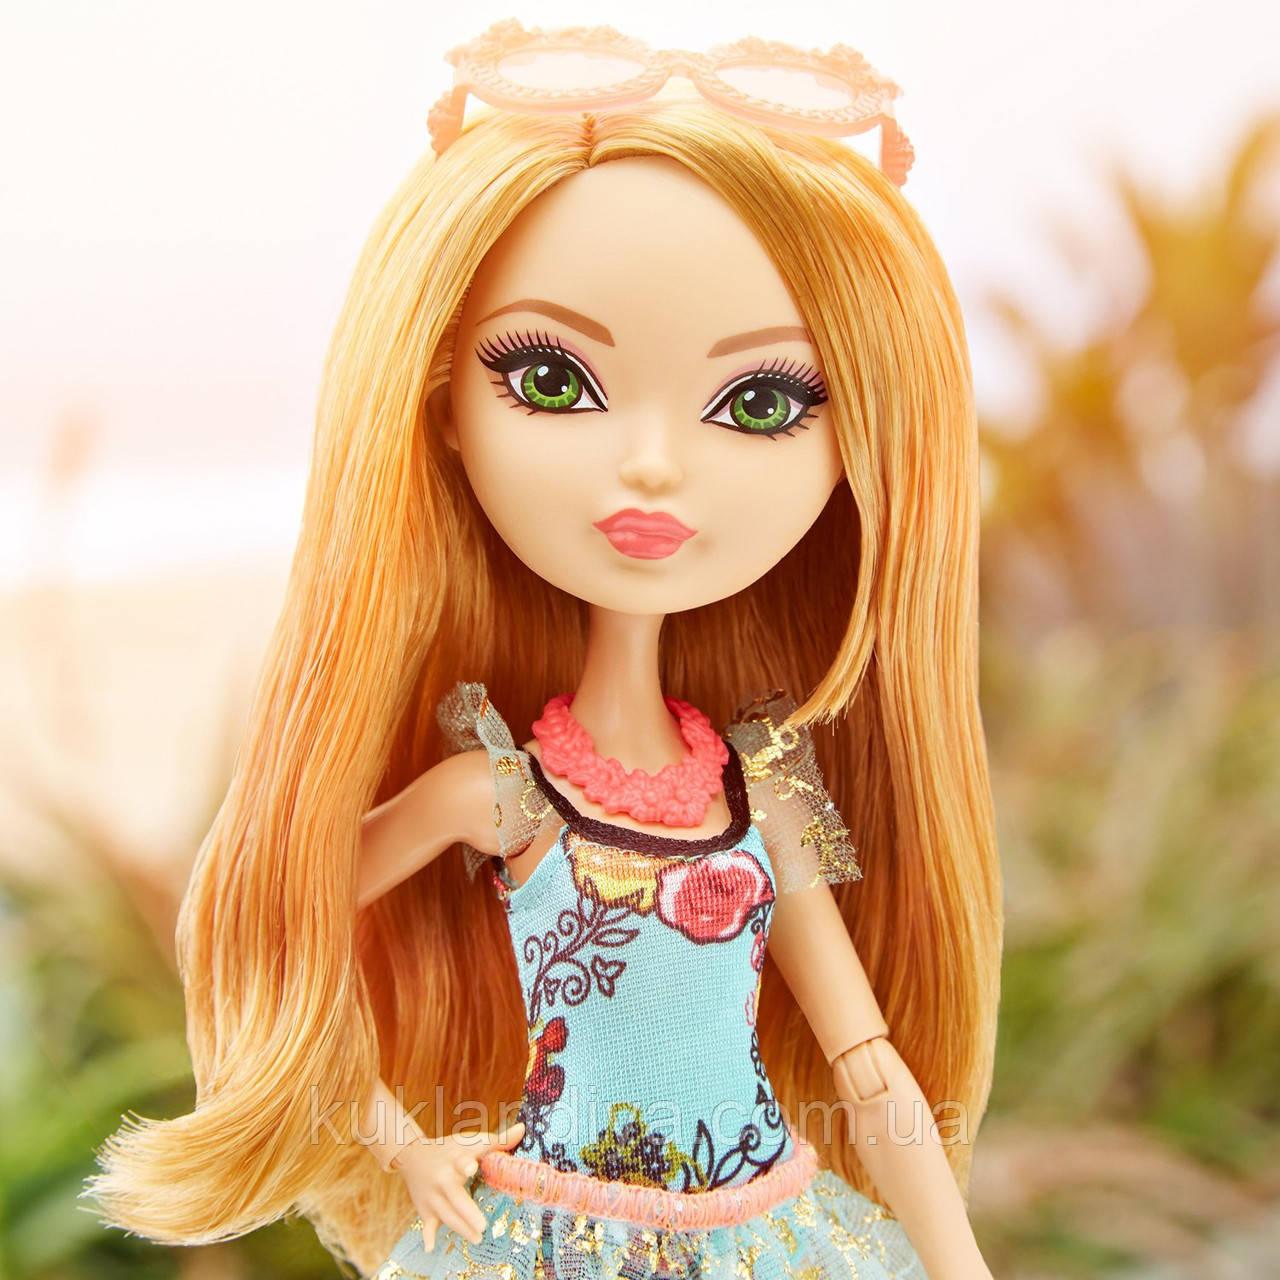 Куклы эвер афтер хай фото пляж